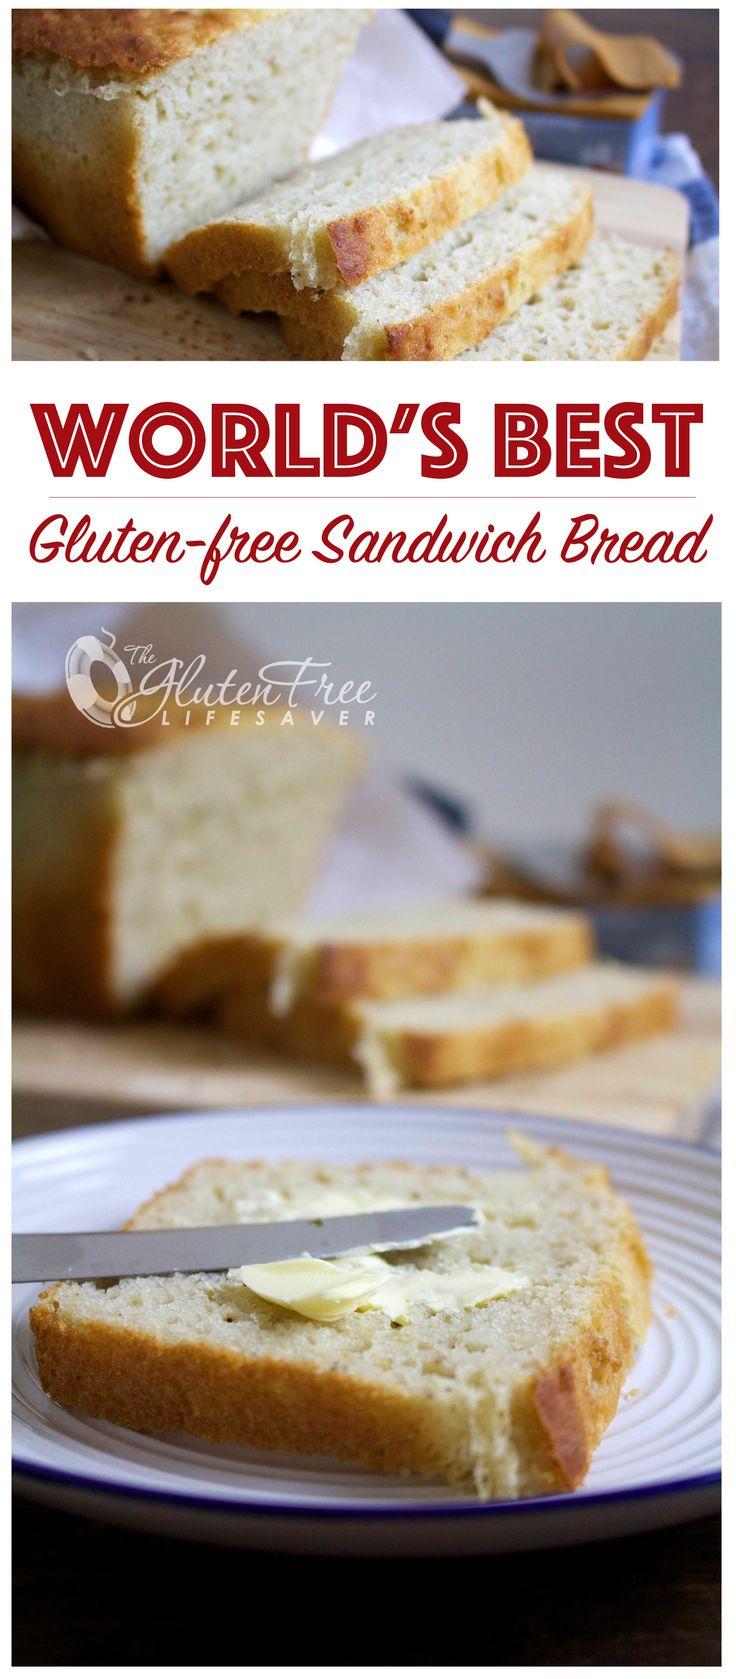 Gluten-free sandwich bread recipe! This is good since all my girls have gluten allergies.